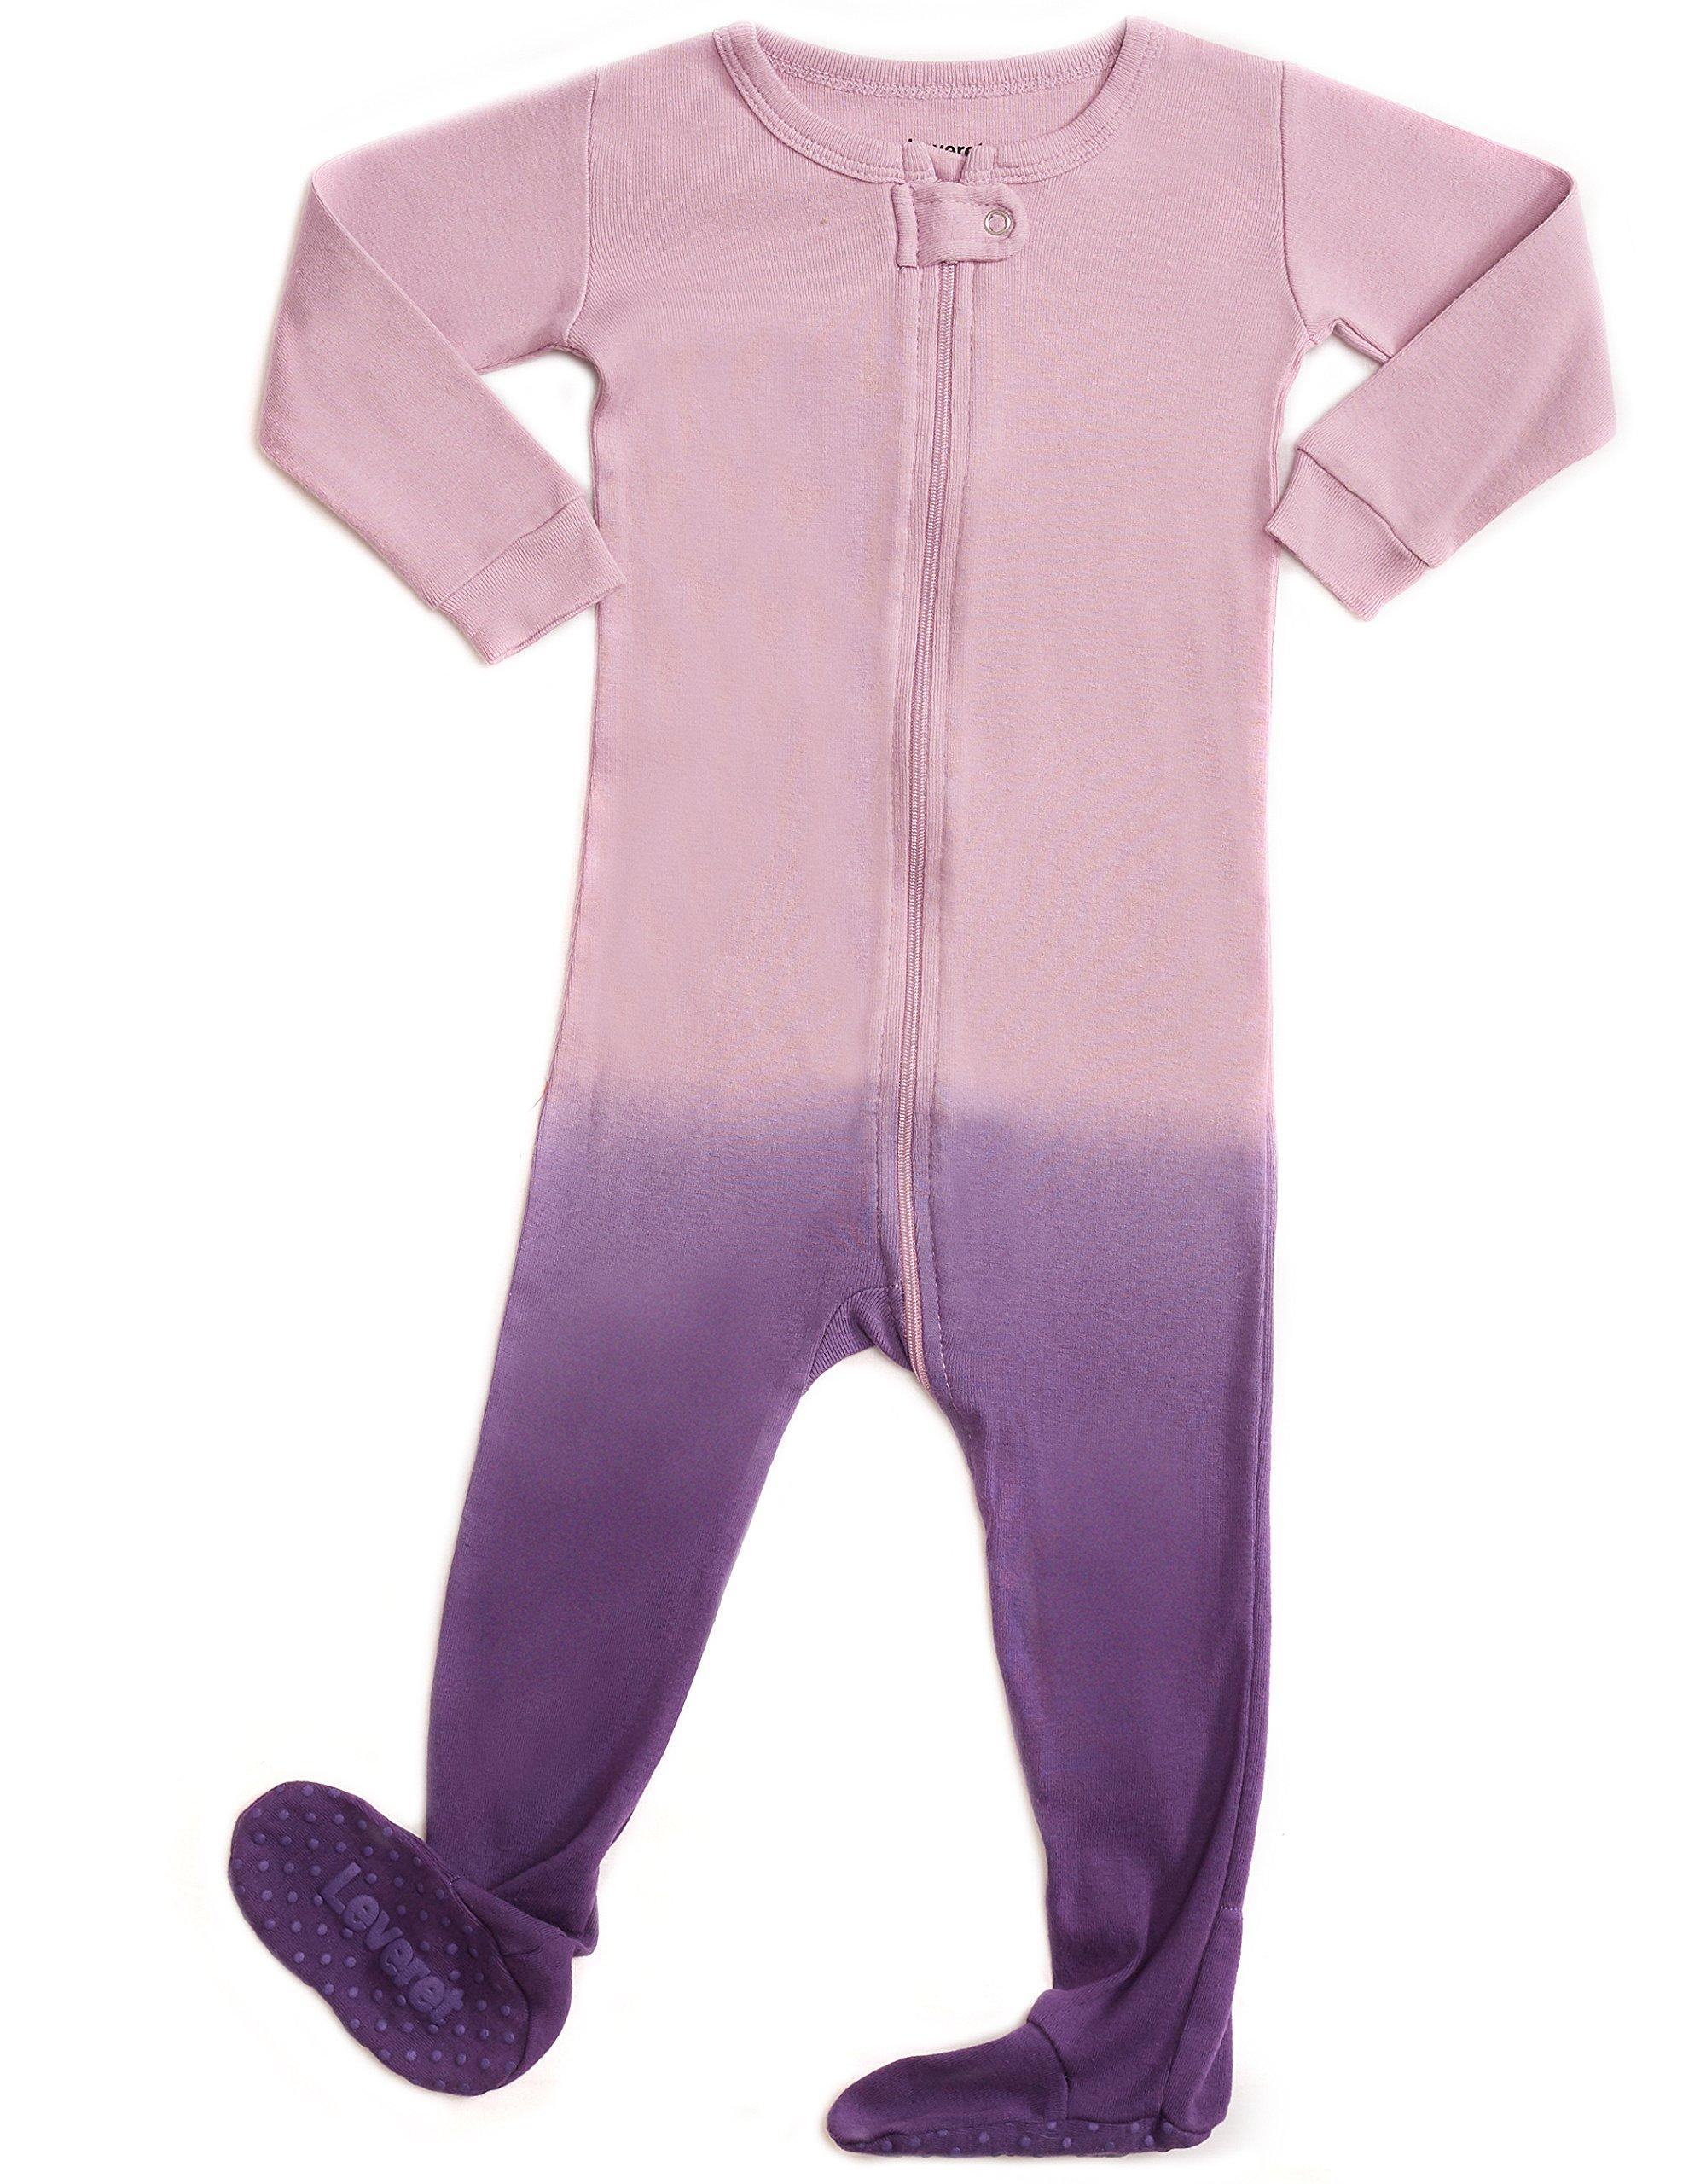 Leveret Kids Organic Cotton Tie-Dye Purple Baby